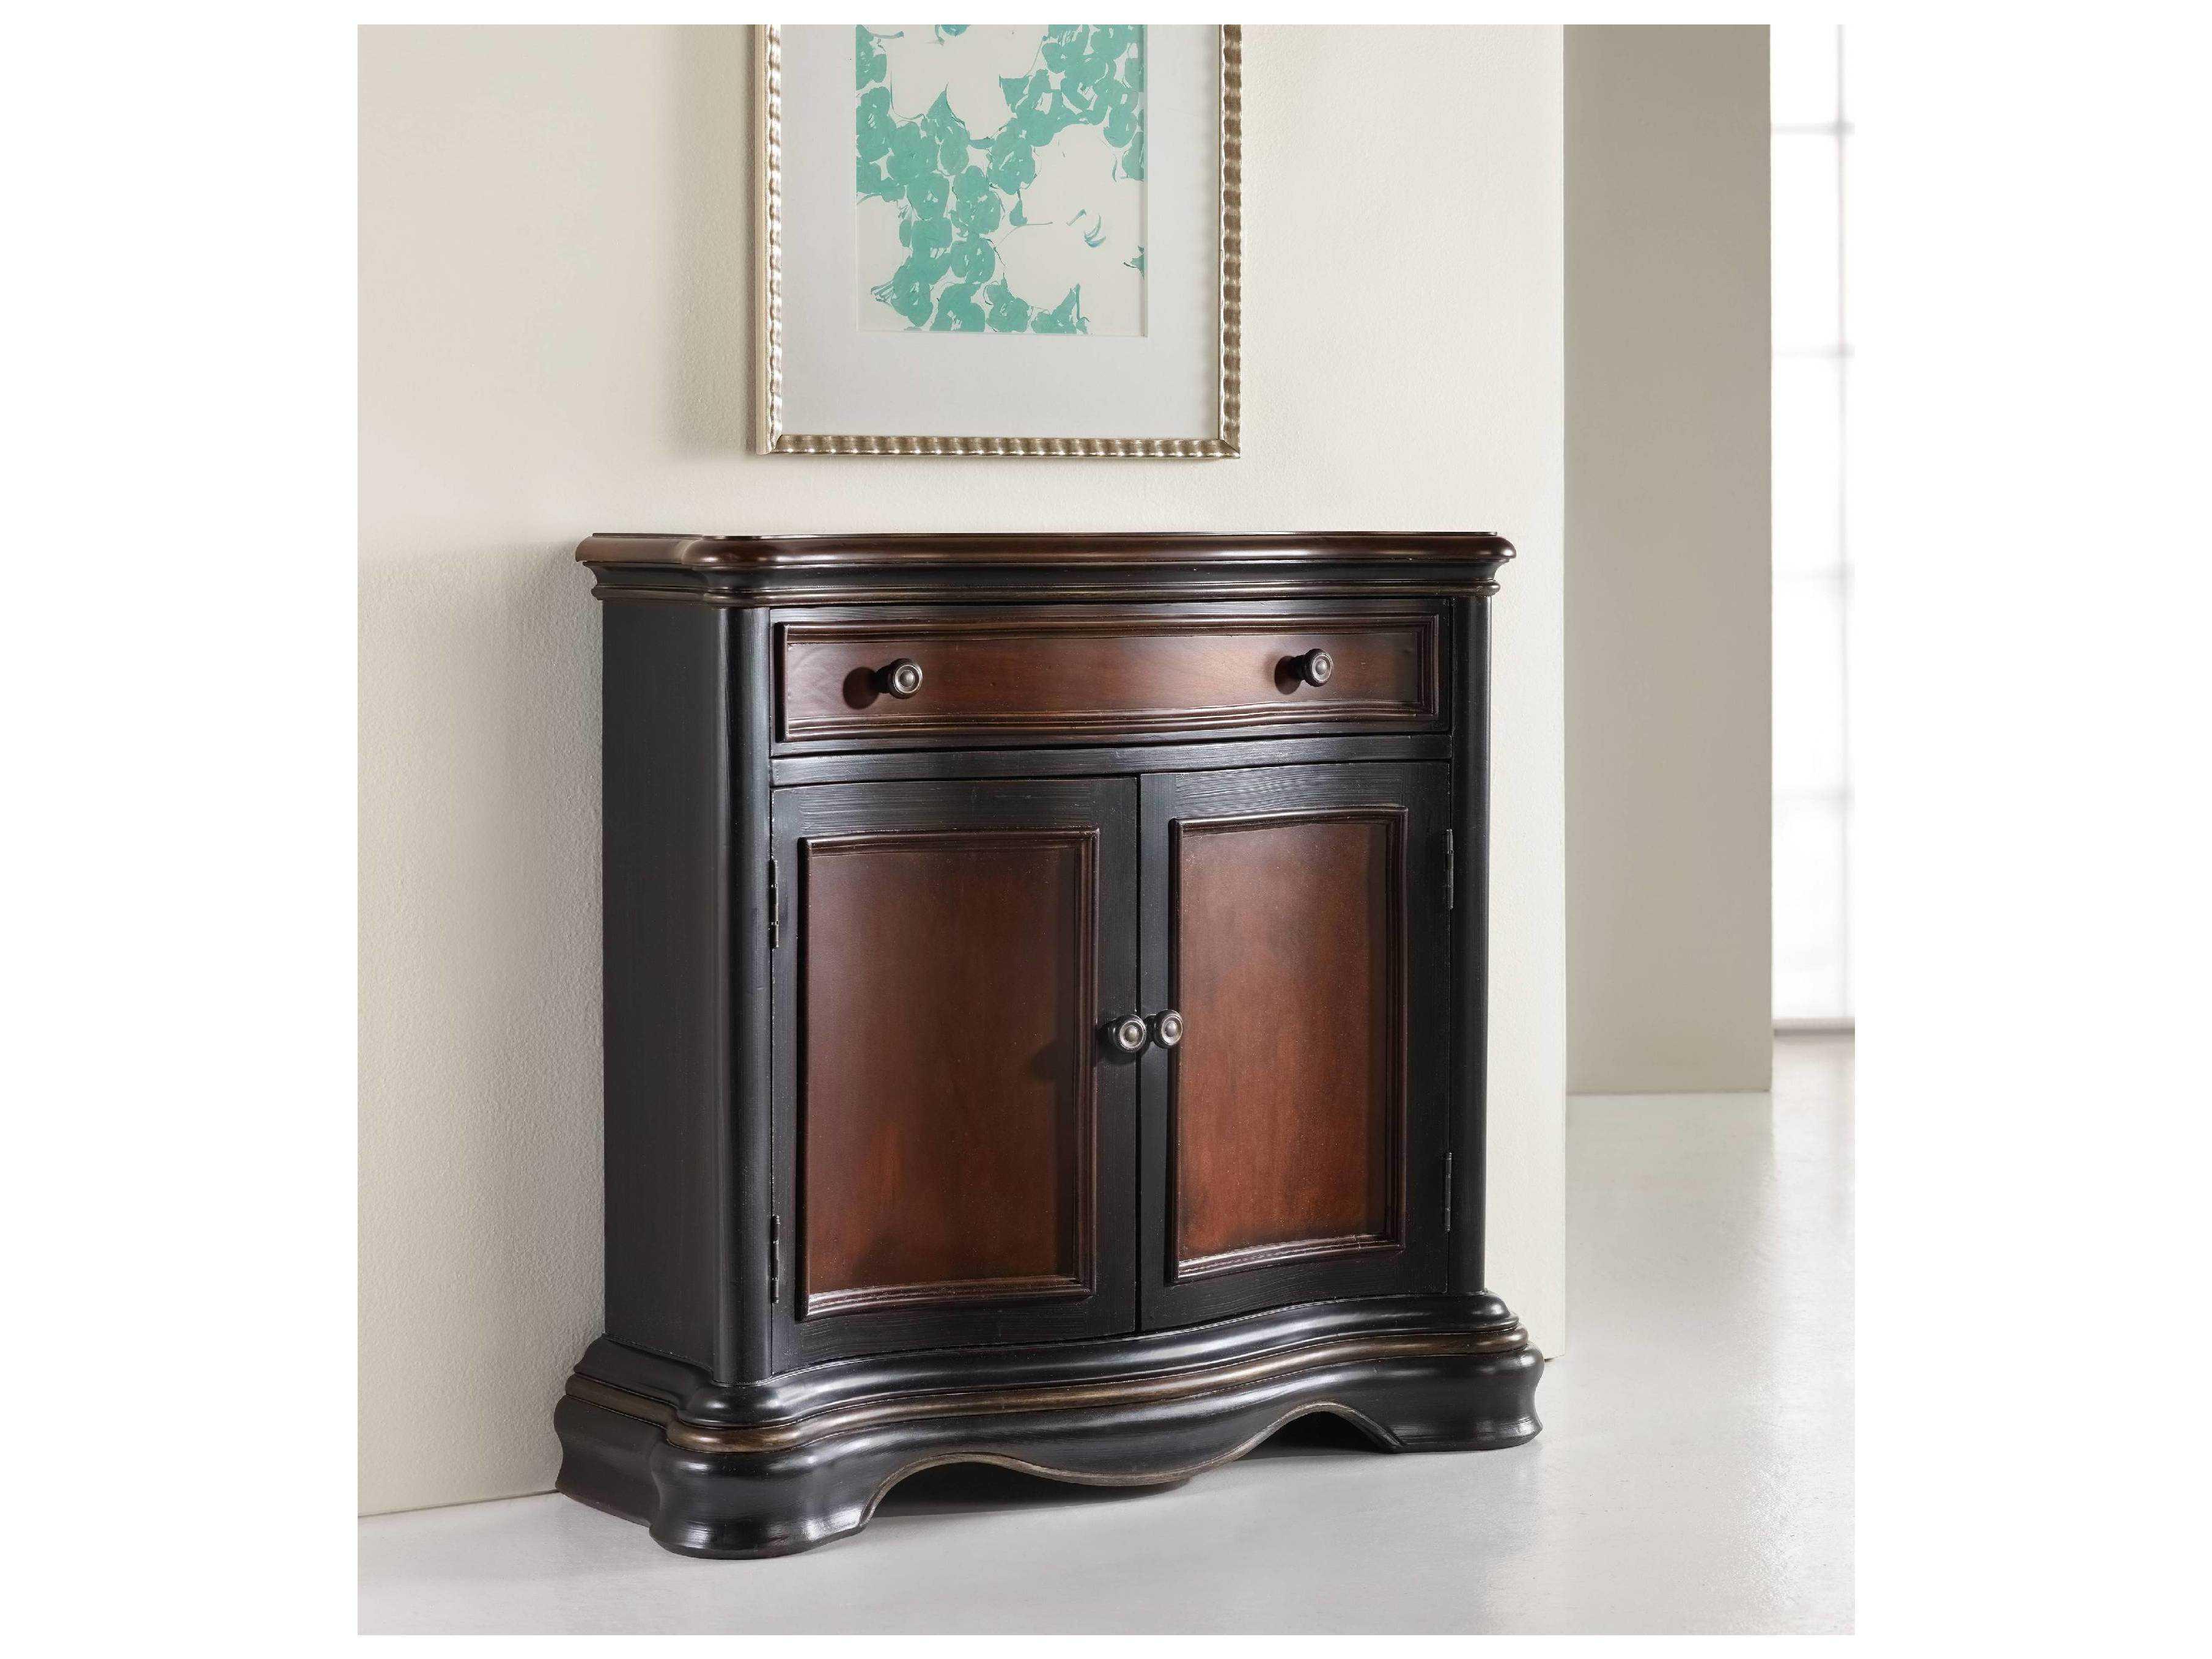 Hooker furniture preston ridge black 35 39 39 l x 12 39 39 w hall for 35 console table